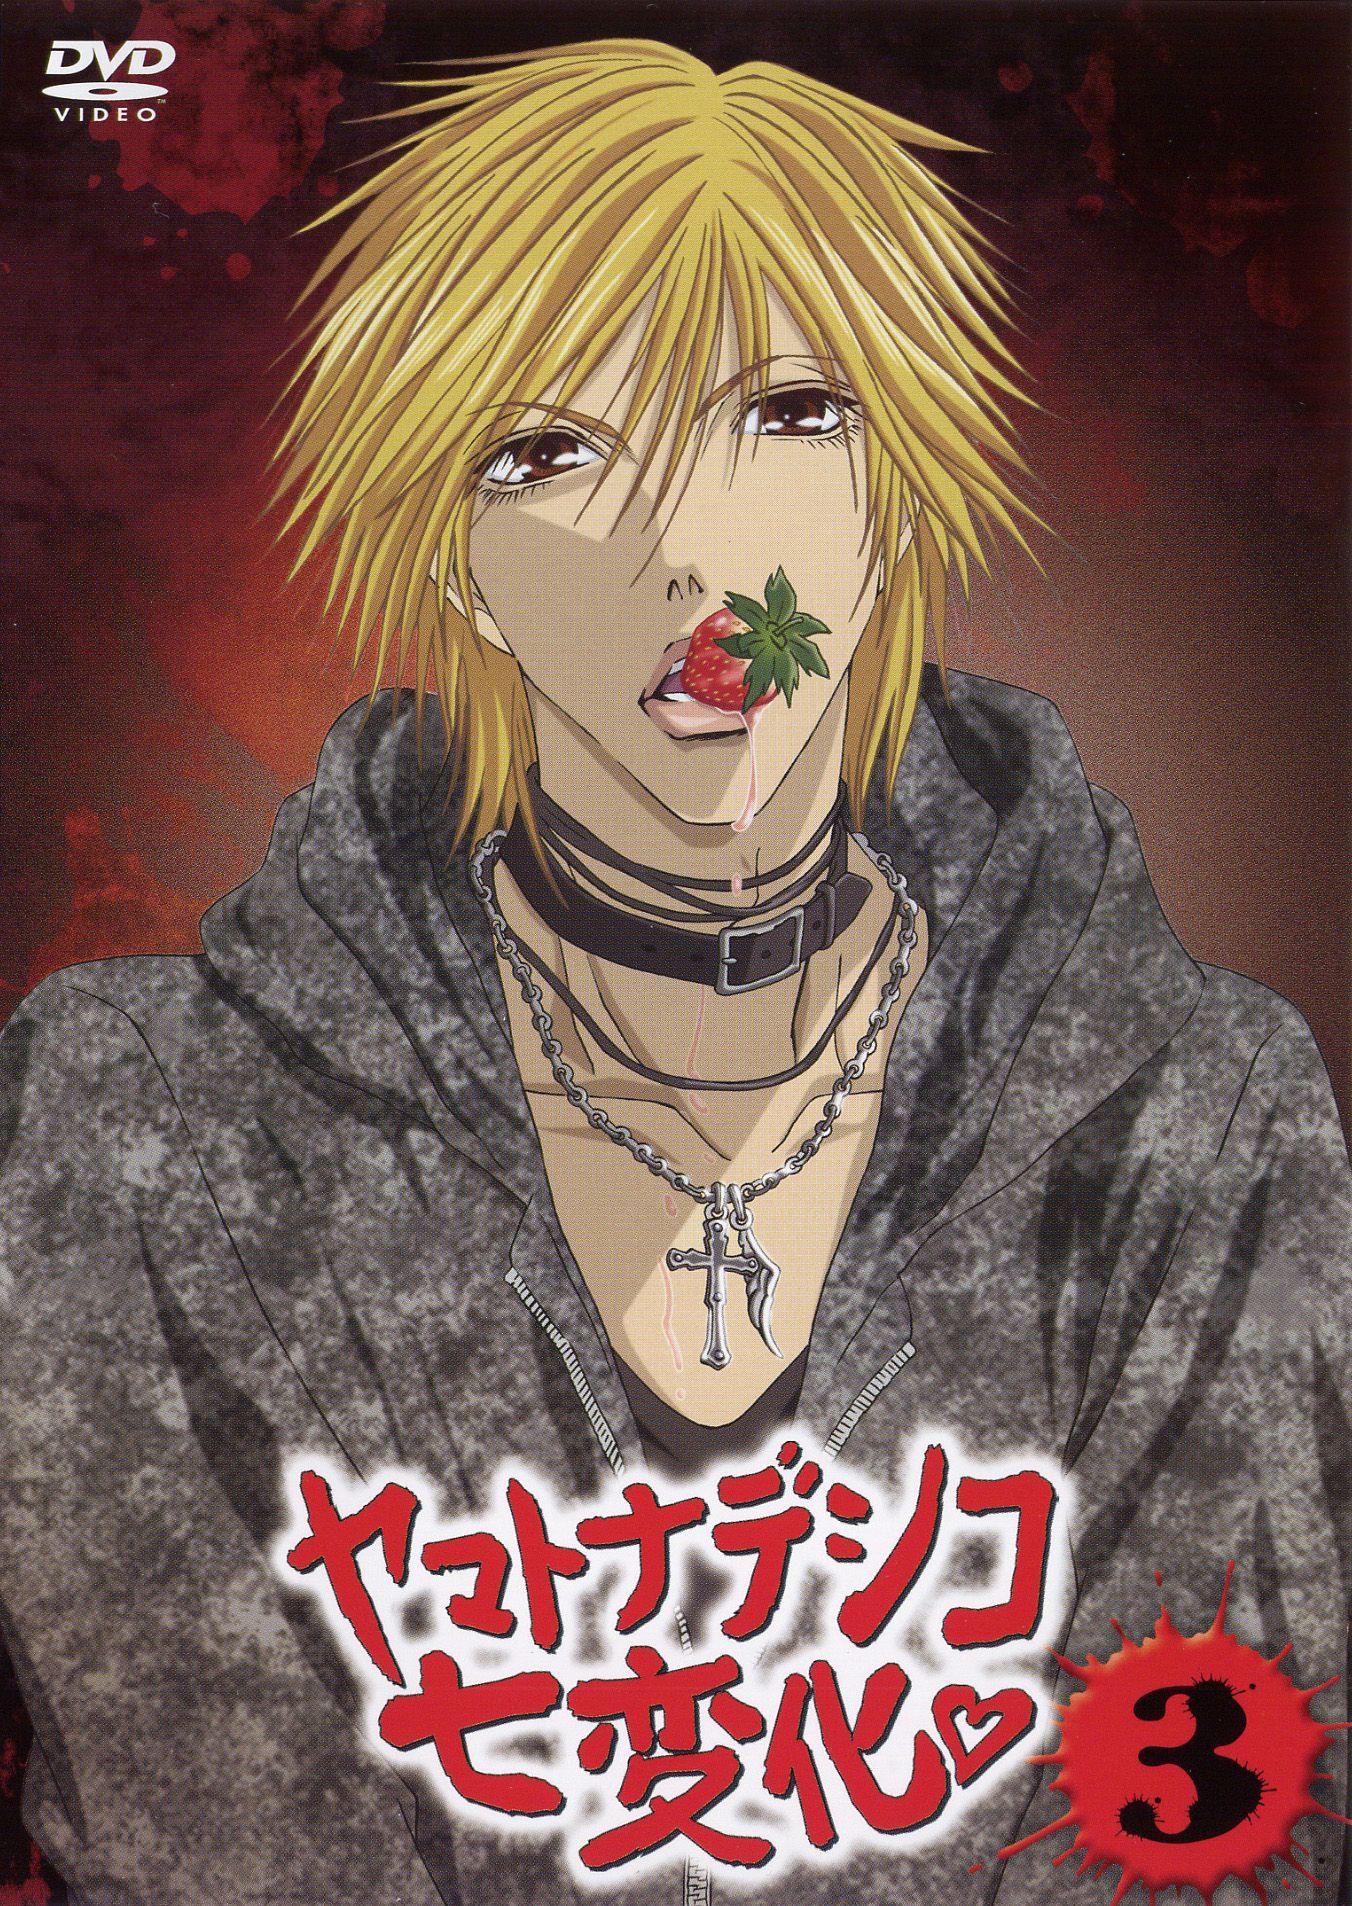 Kyohei Takano From The Wallflower Anime Wallflower Anime Yamato